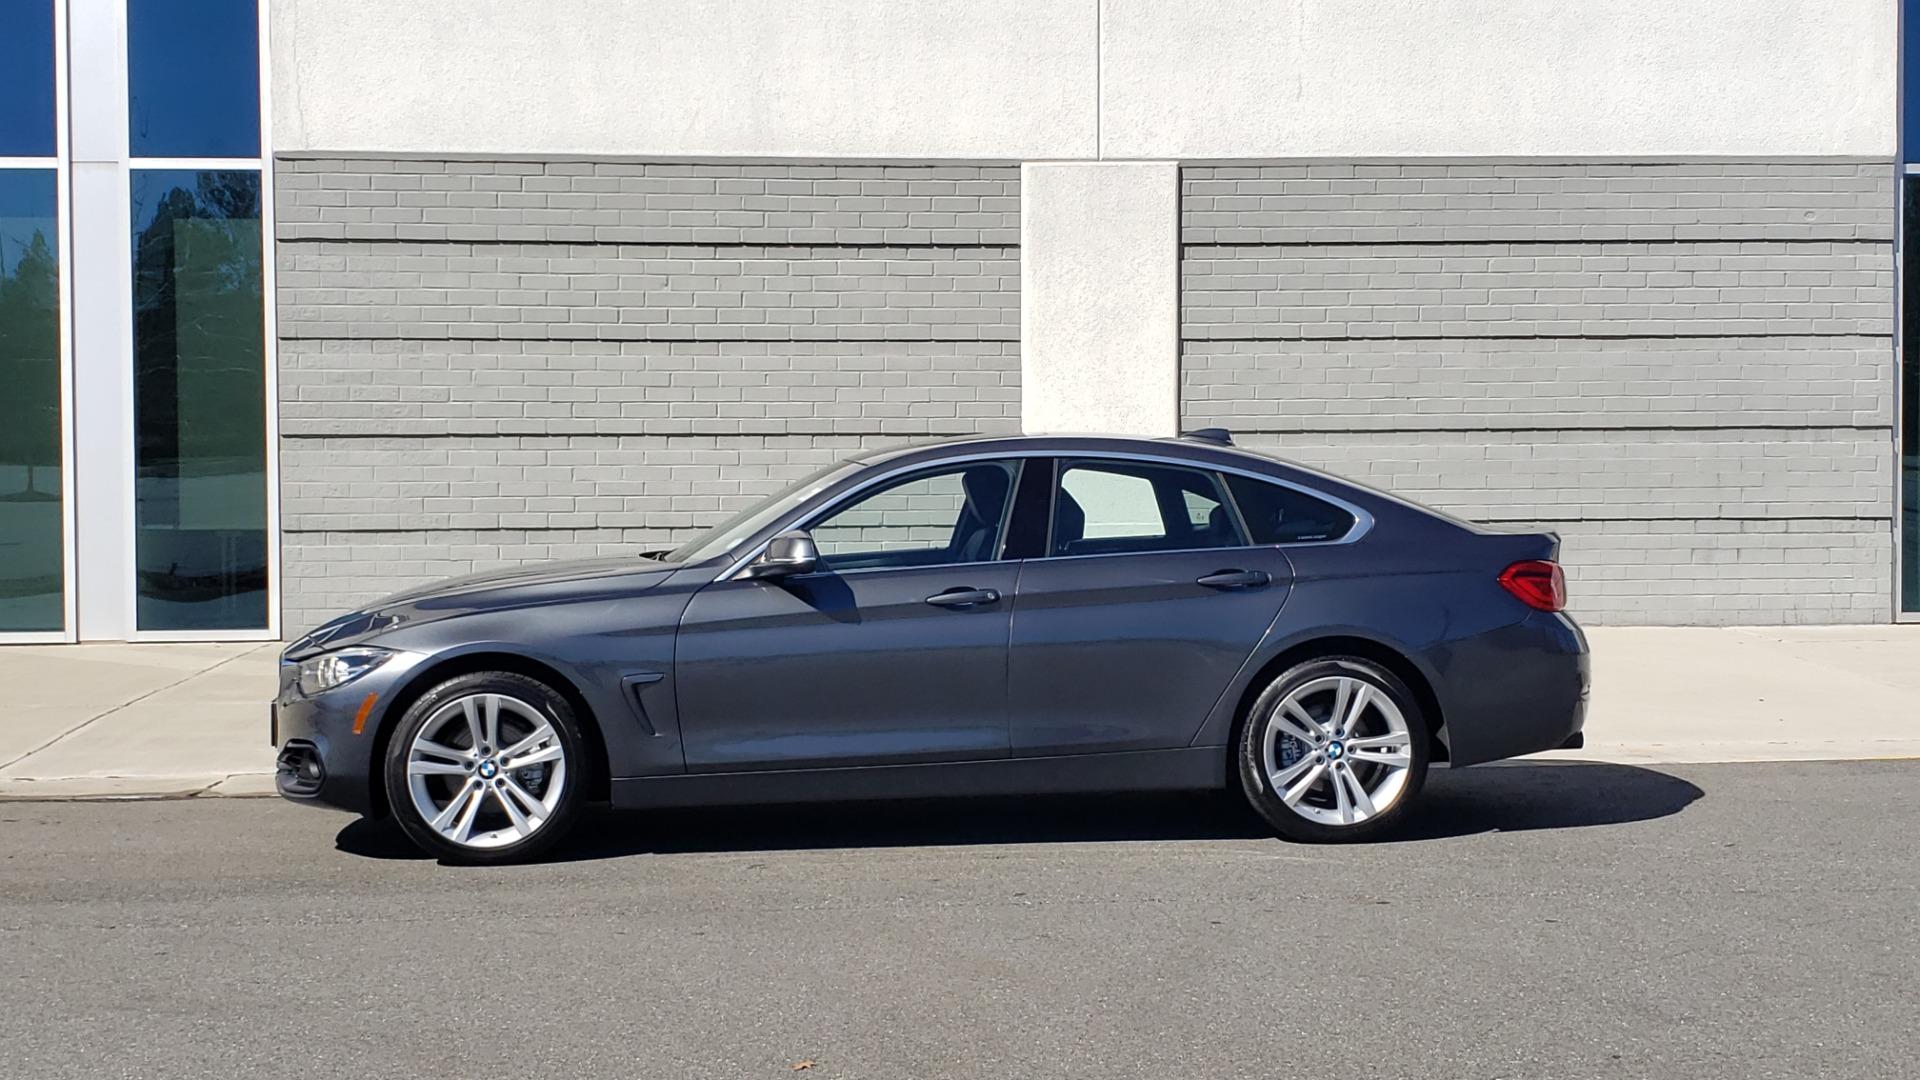 Used 2018 BMW 4 SERIES 430IXDRIVE / PREMIUM / NAV / SUNROOF / ESSENTIALS PKG for sale $29,495 at Formula Imports in Charlotte NC 28227 3